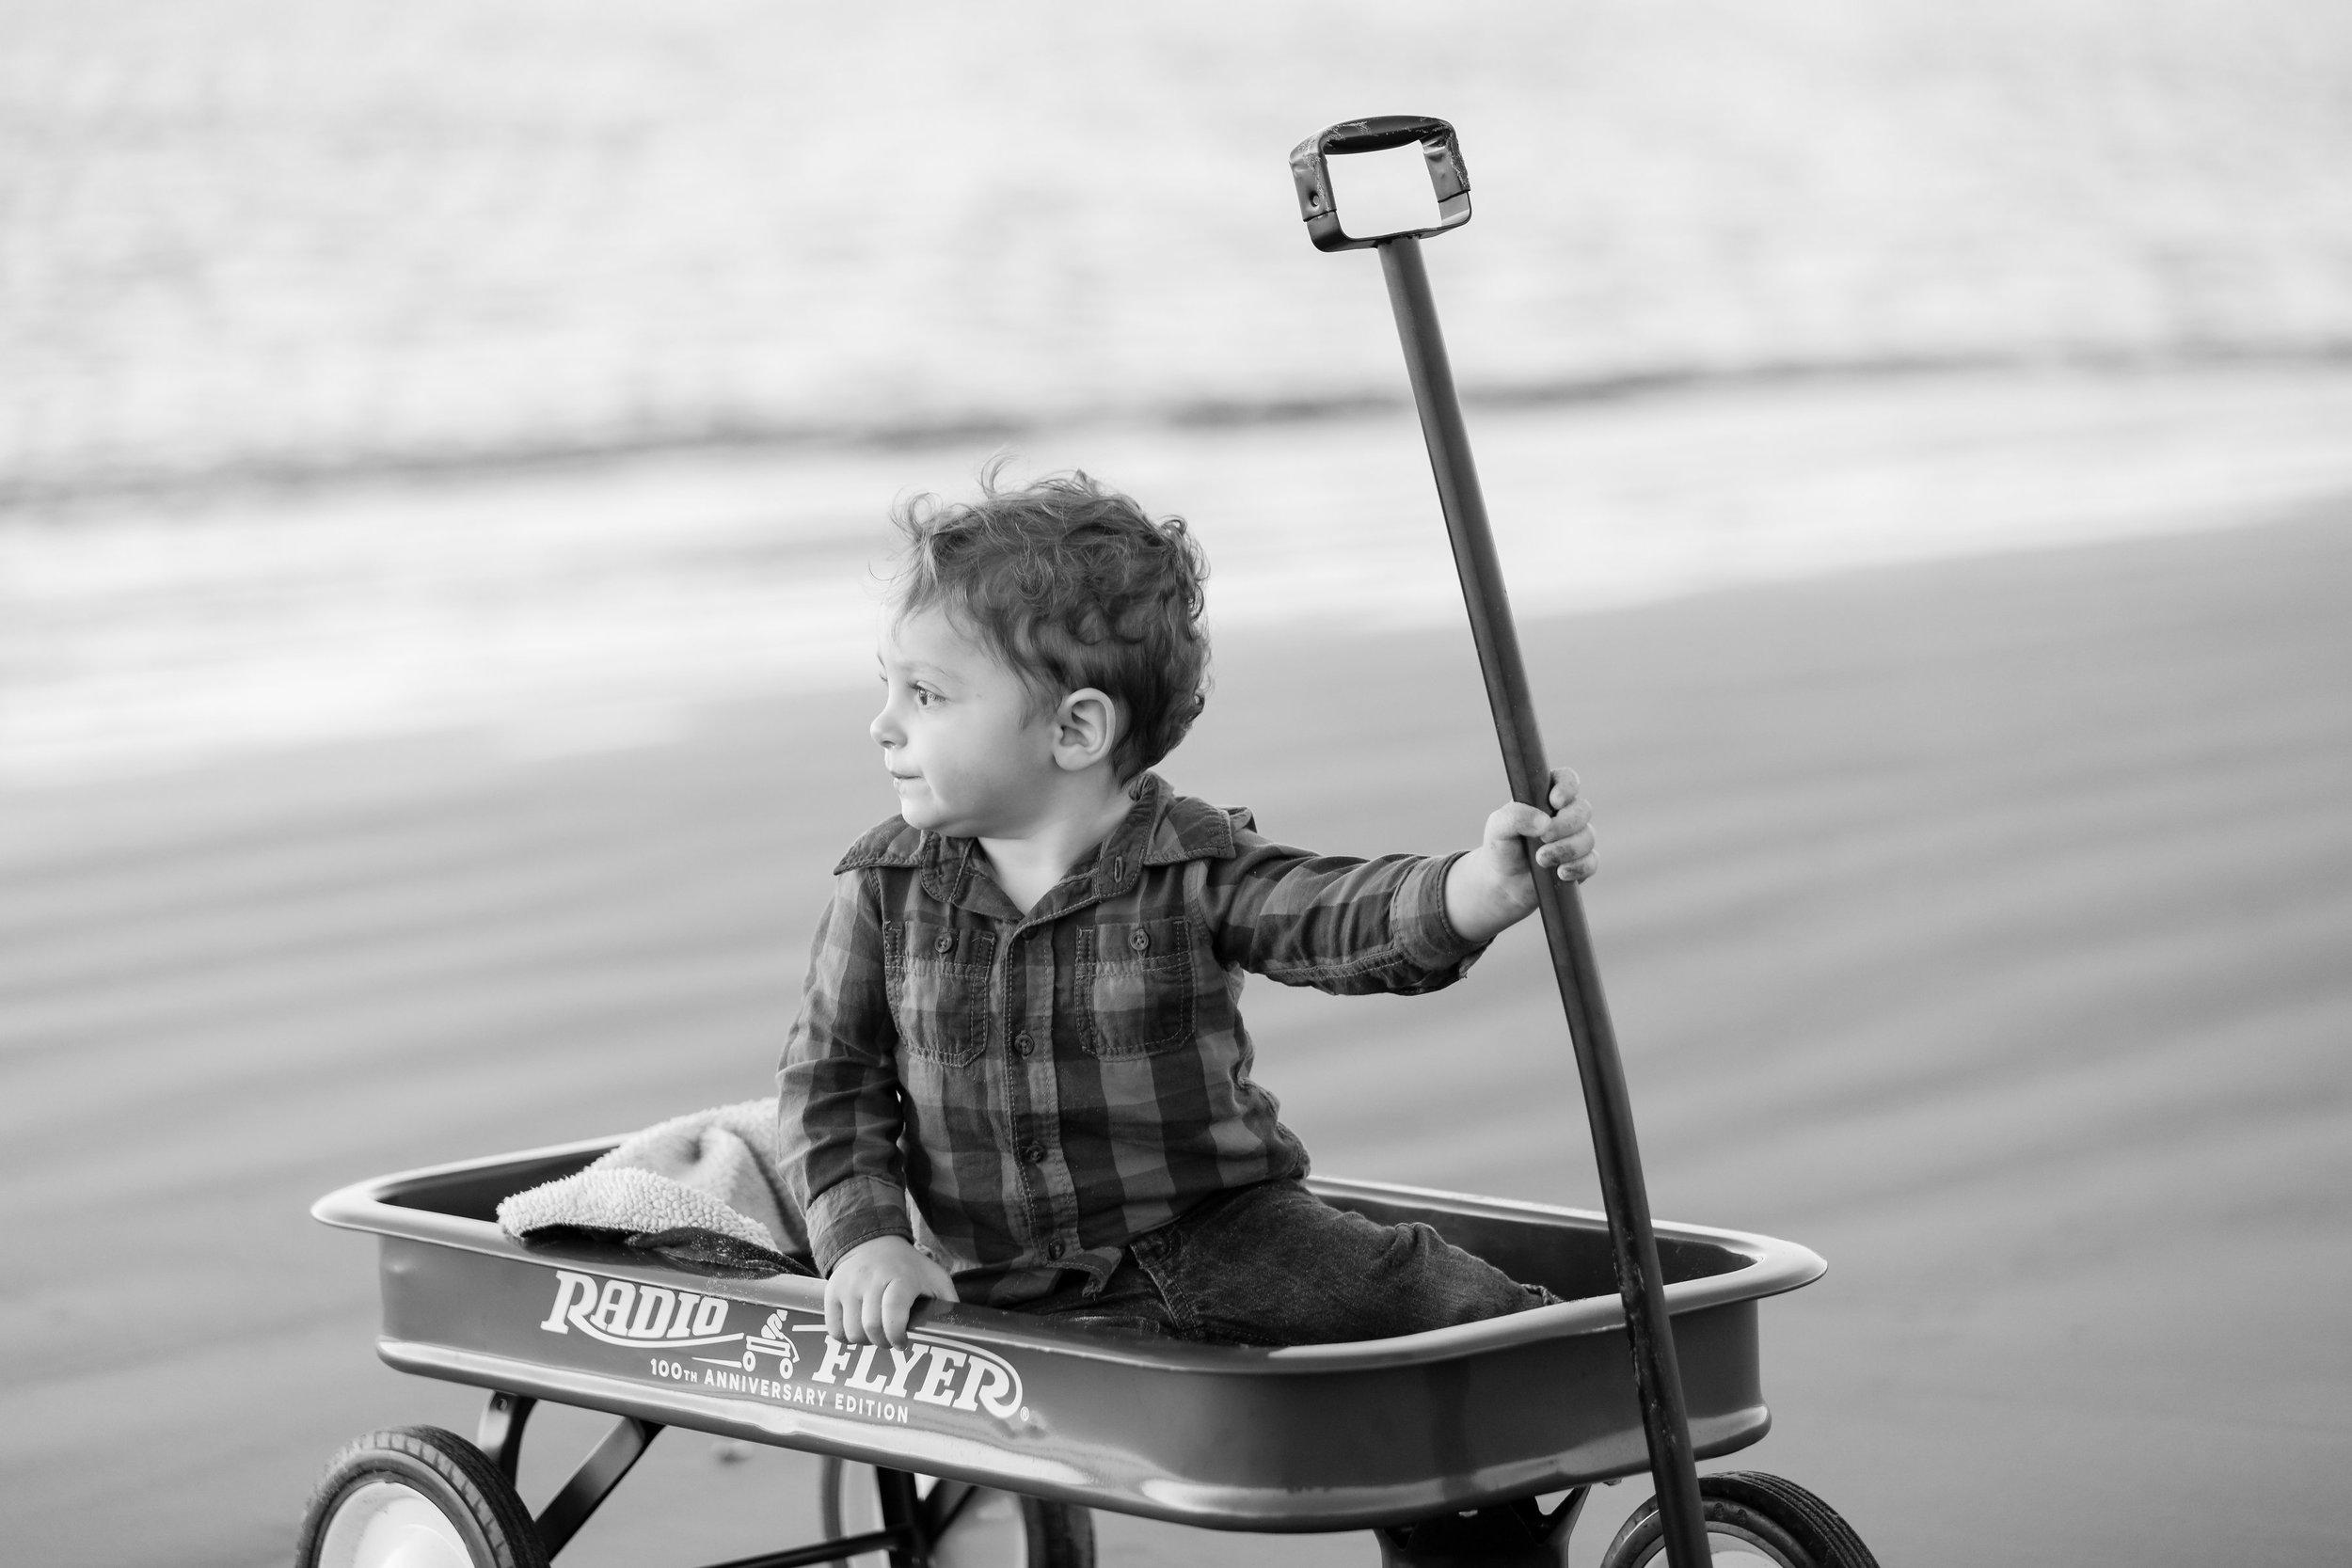 kiddo radio flyer beach boy seal beach portraits.jpg